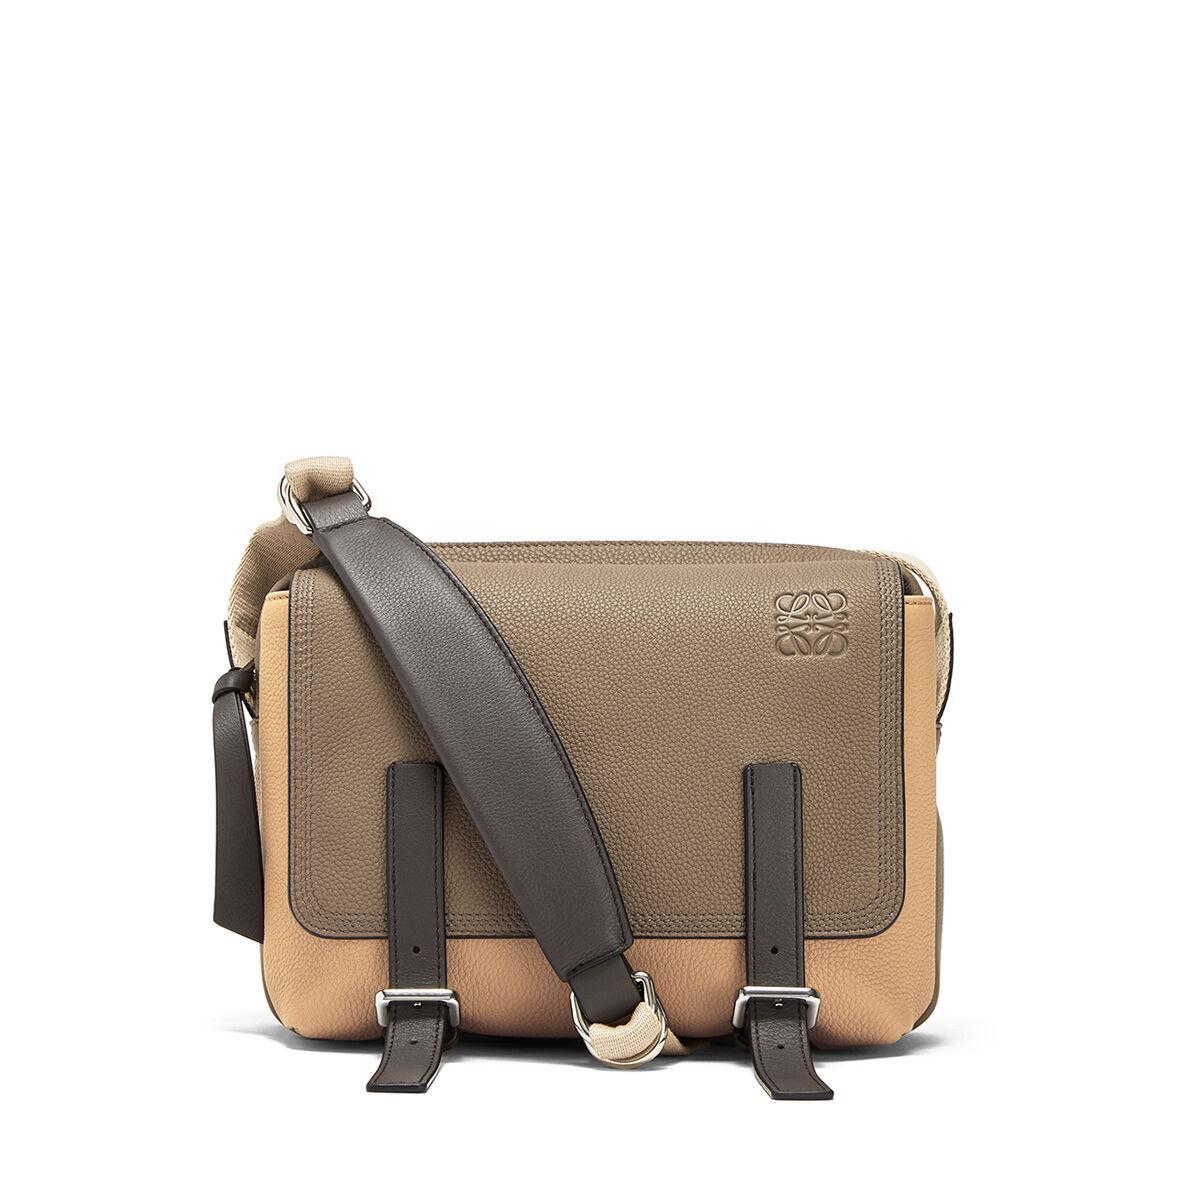 LOEWE Military Messenger Xs Bag Dark Taupe/Desert all